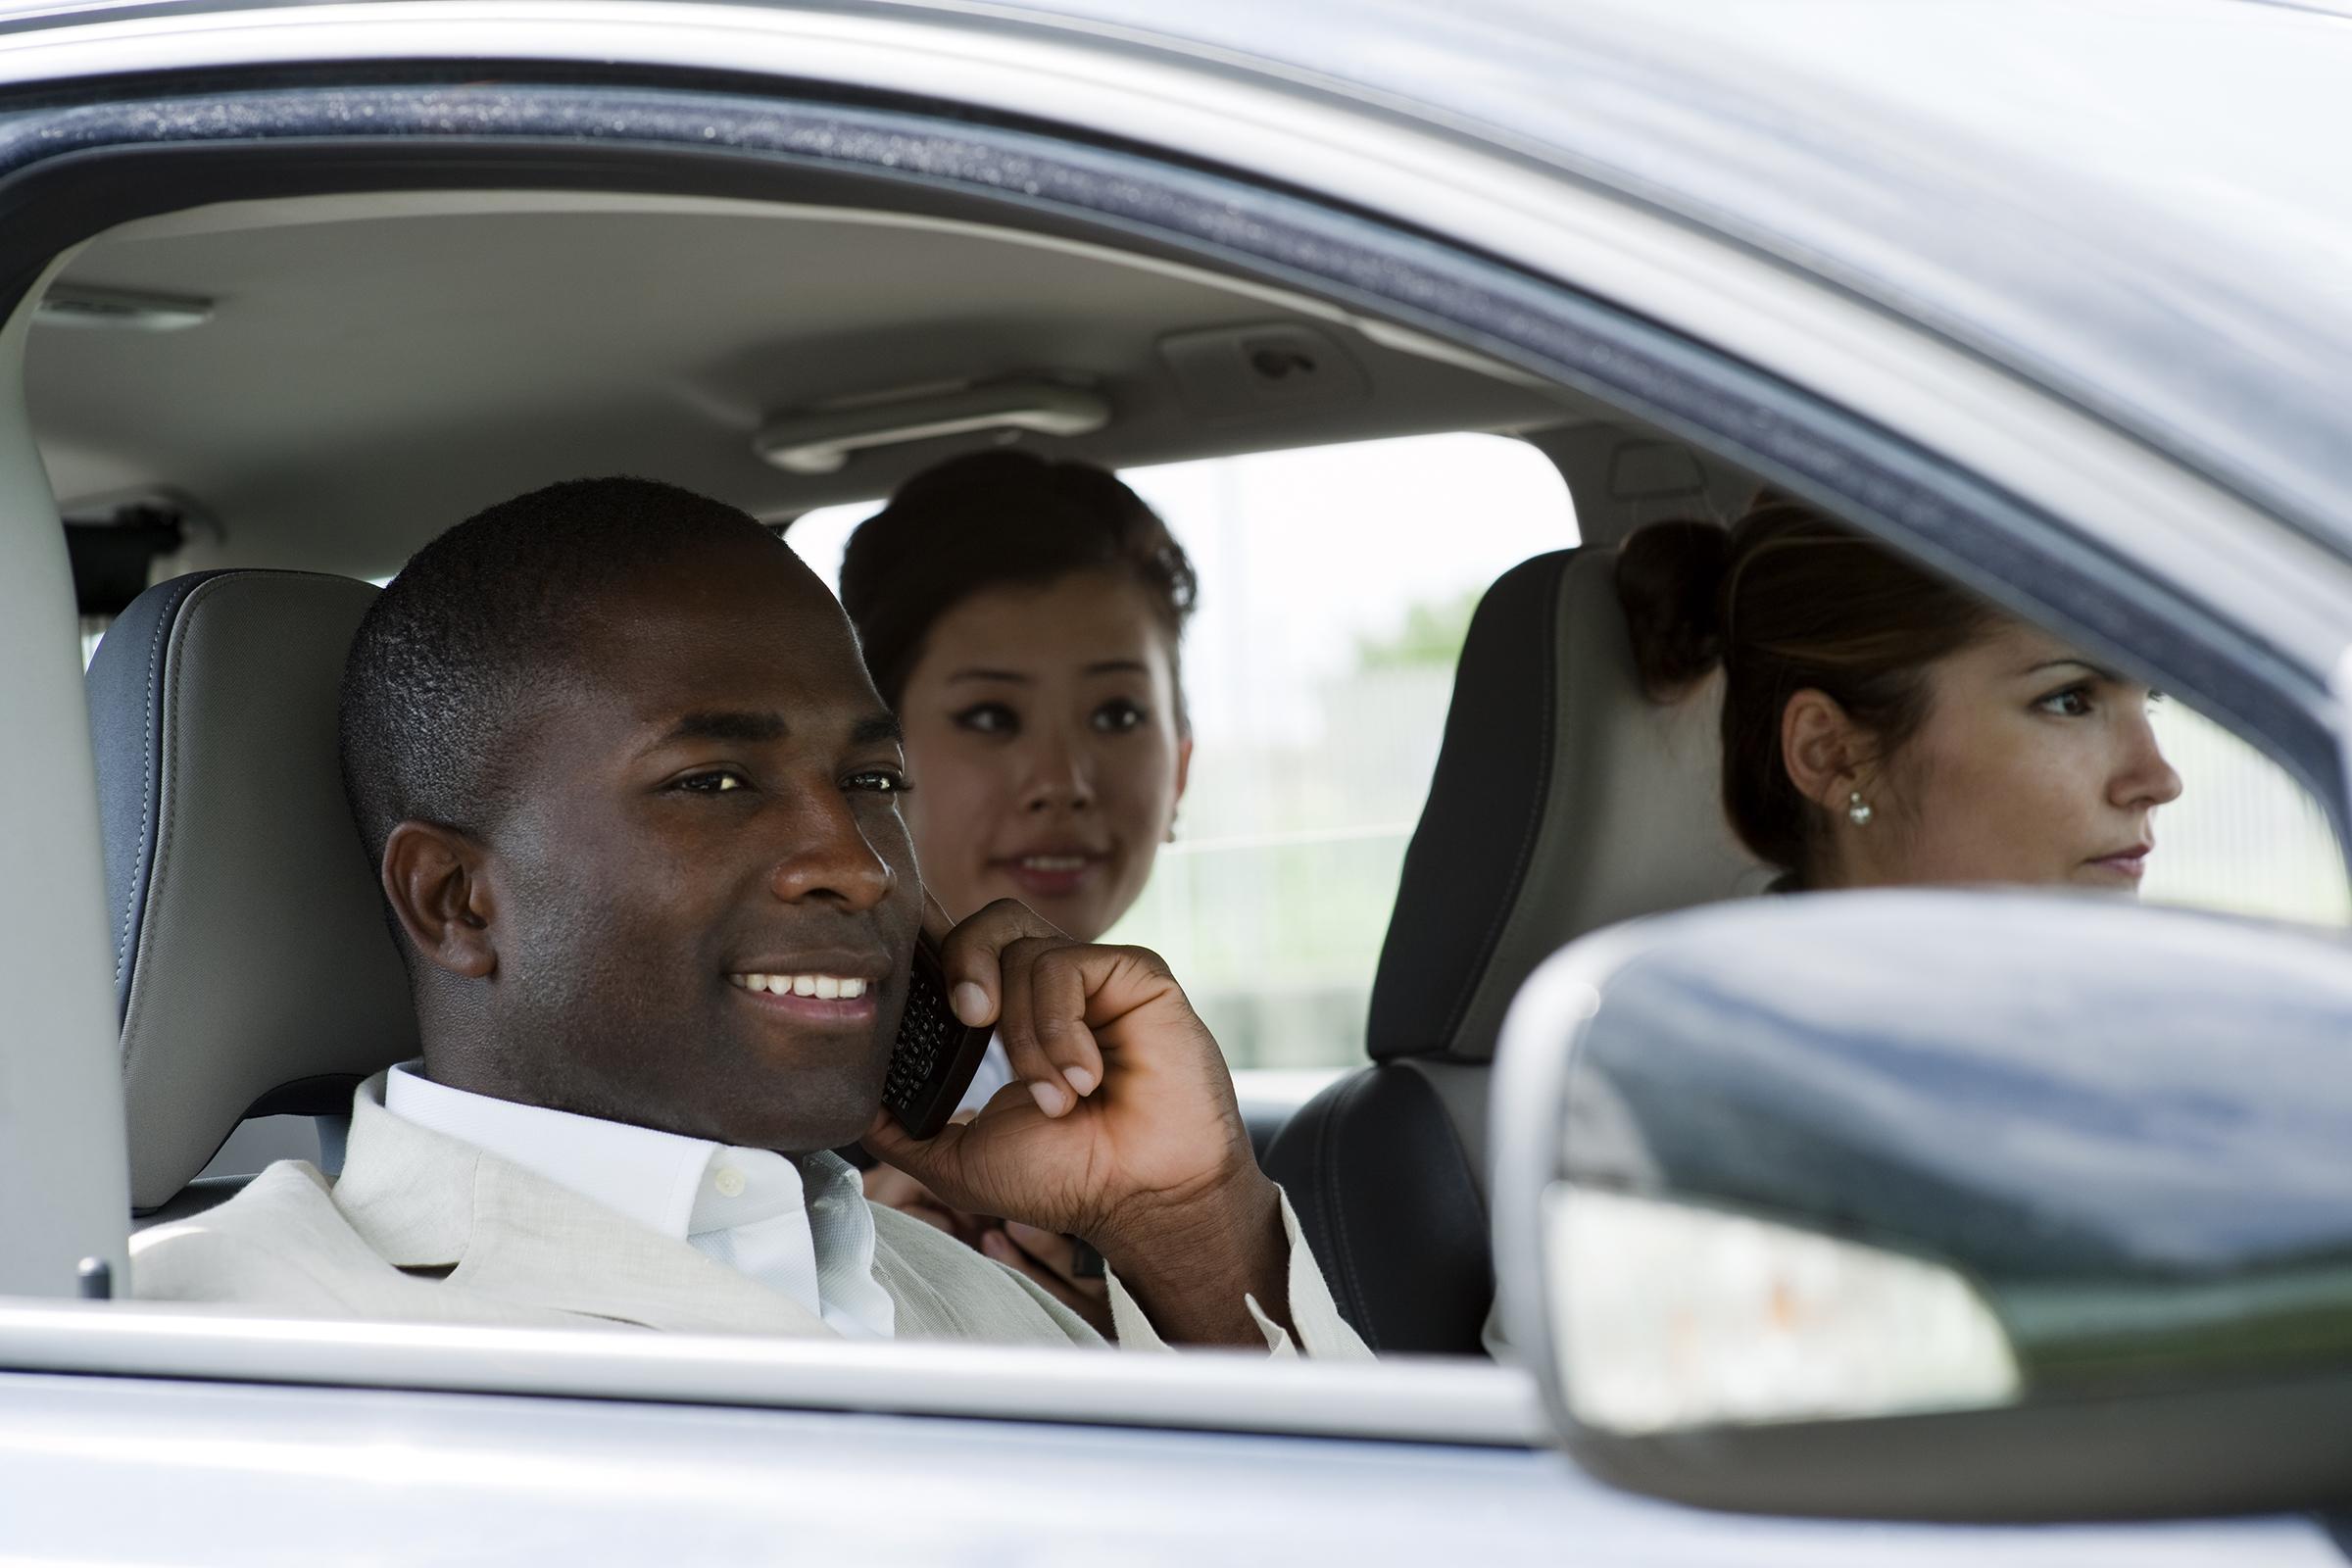 Carpool Commute Option